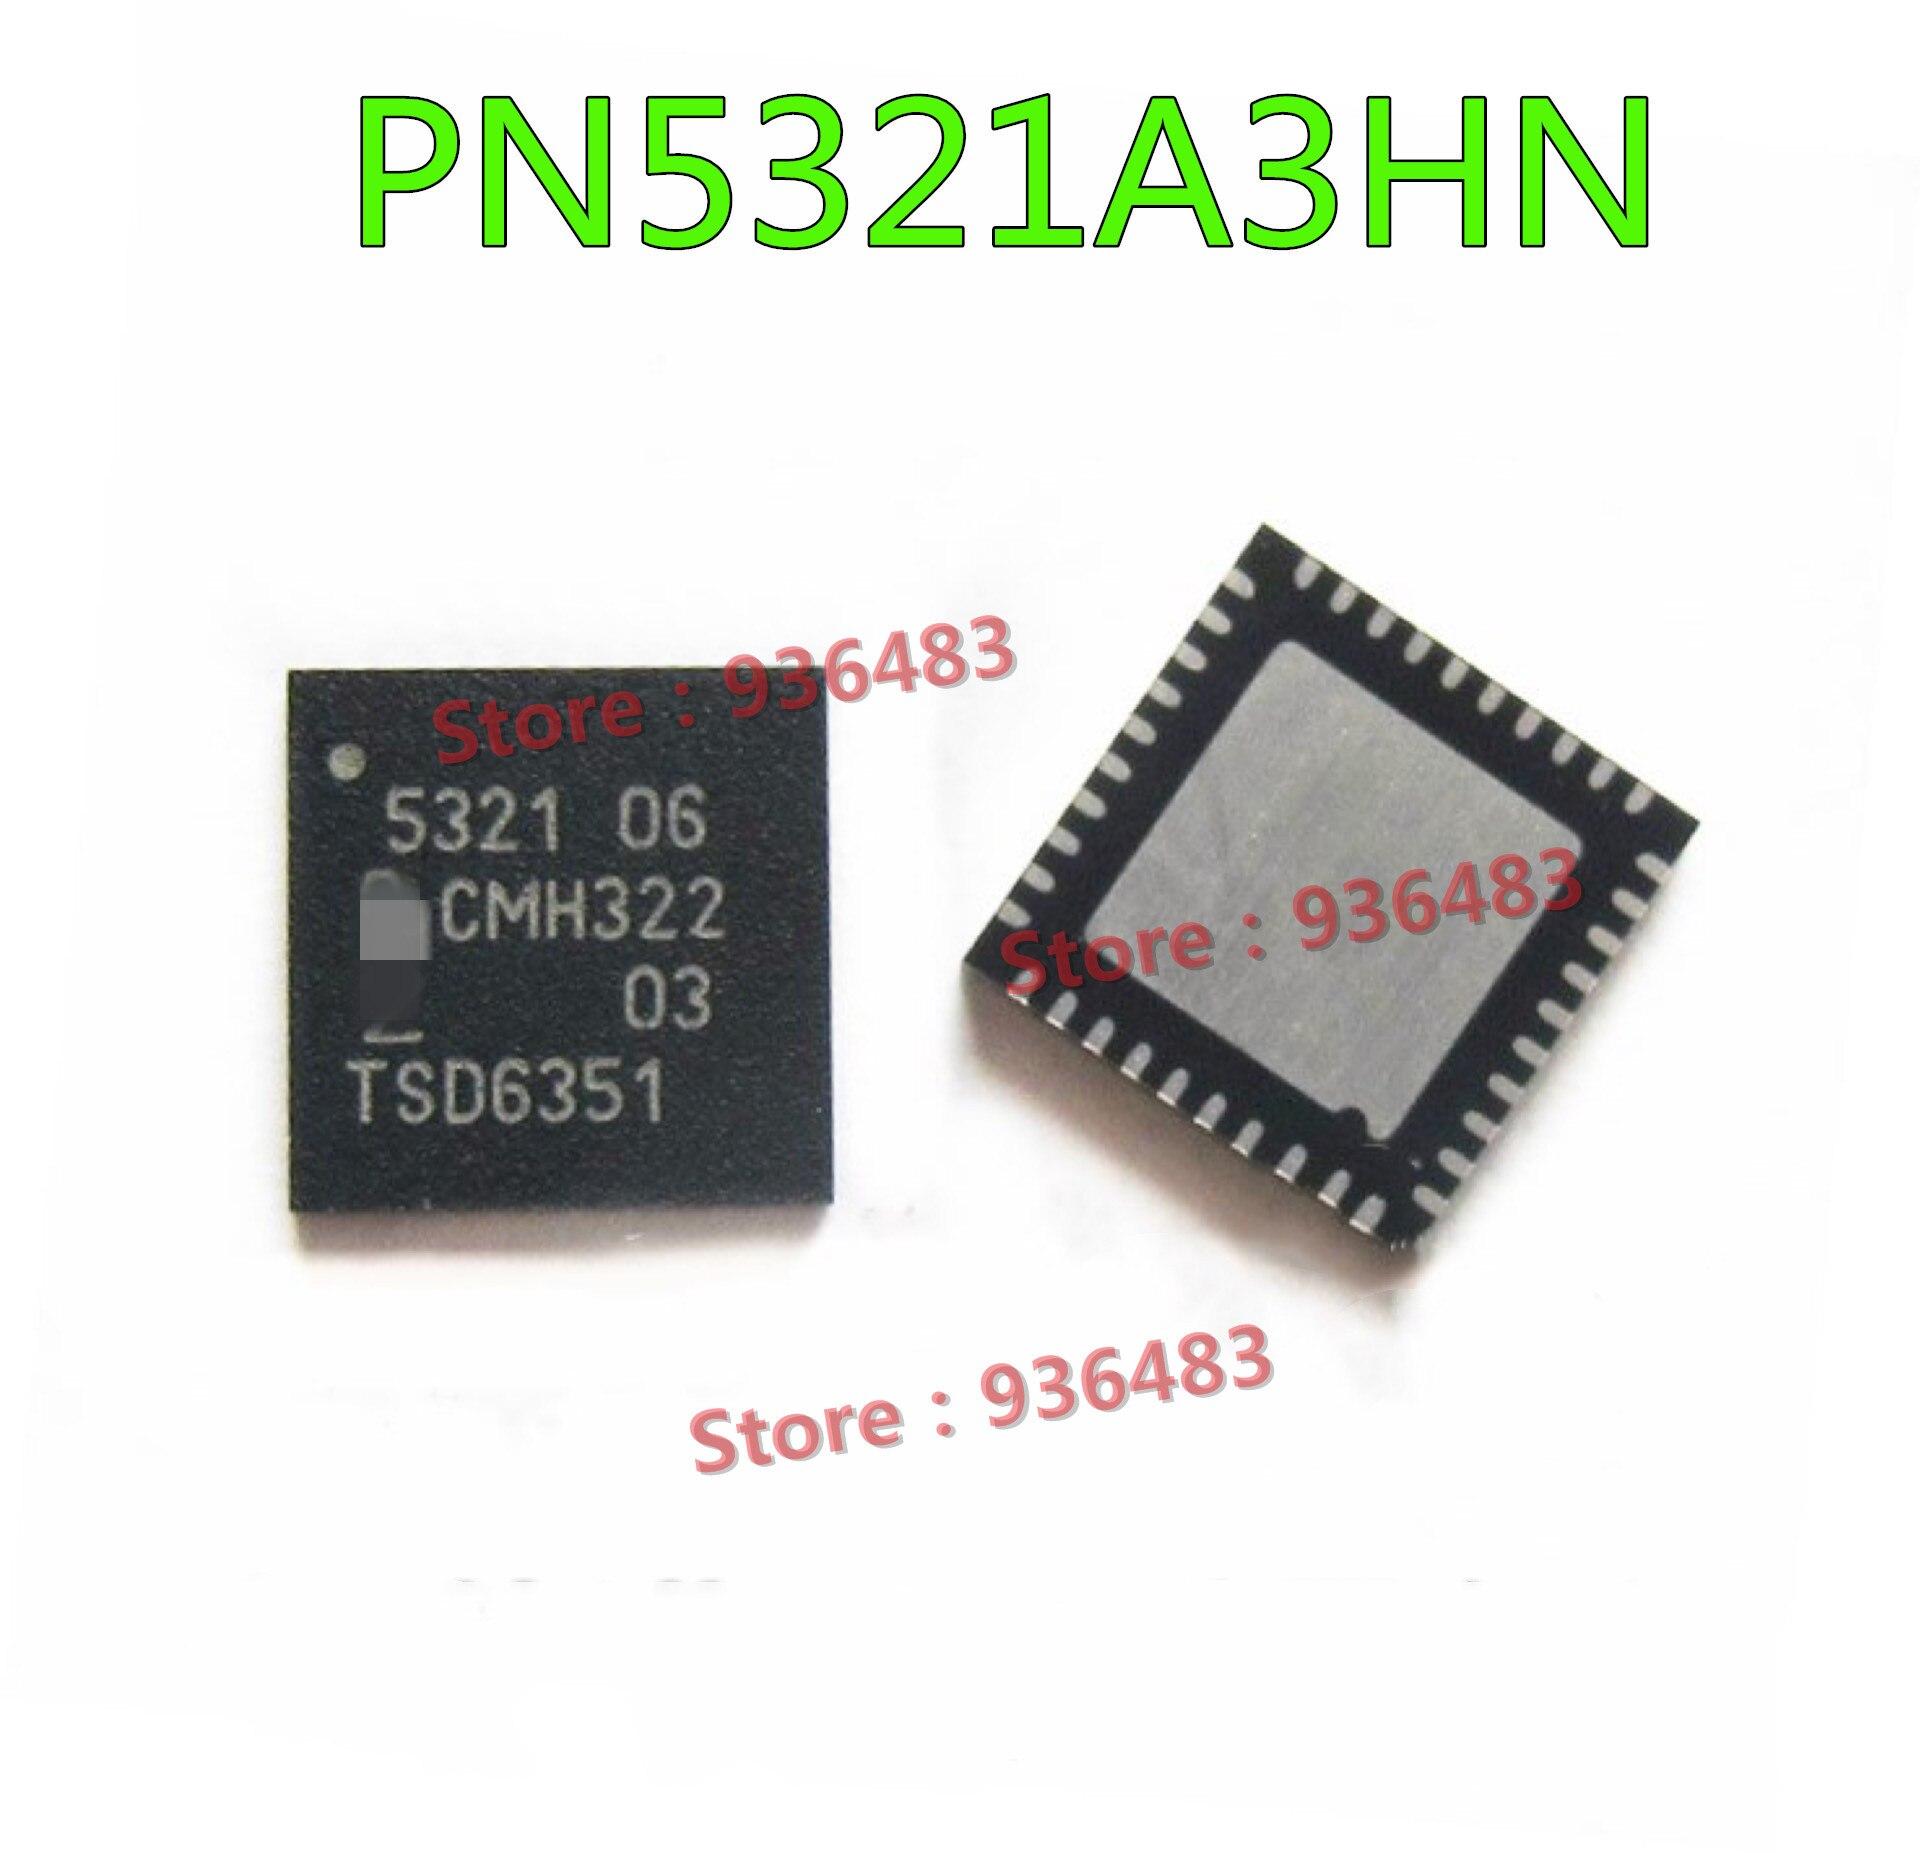 10pcs pn5321a3hn pn5321 pn5321a3hn c106 qfn40 nfc rfid